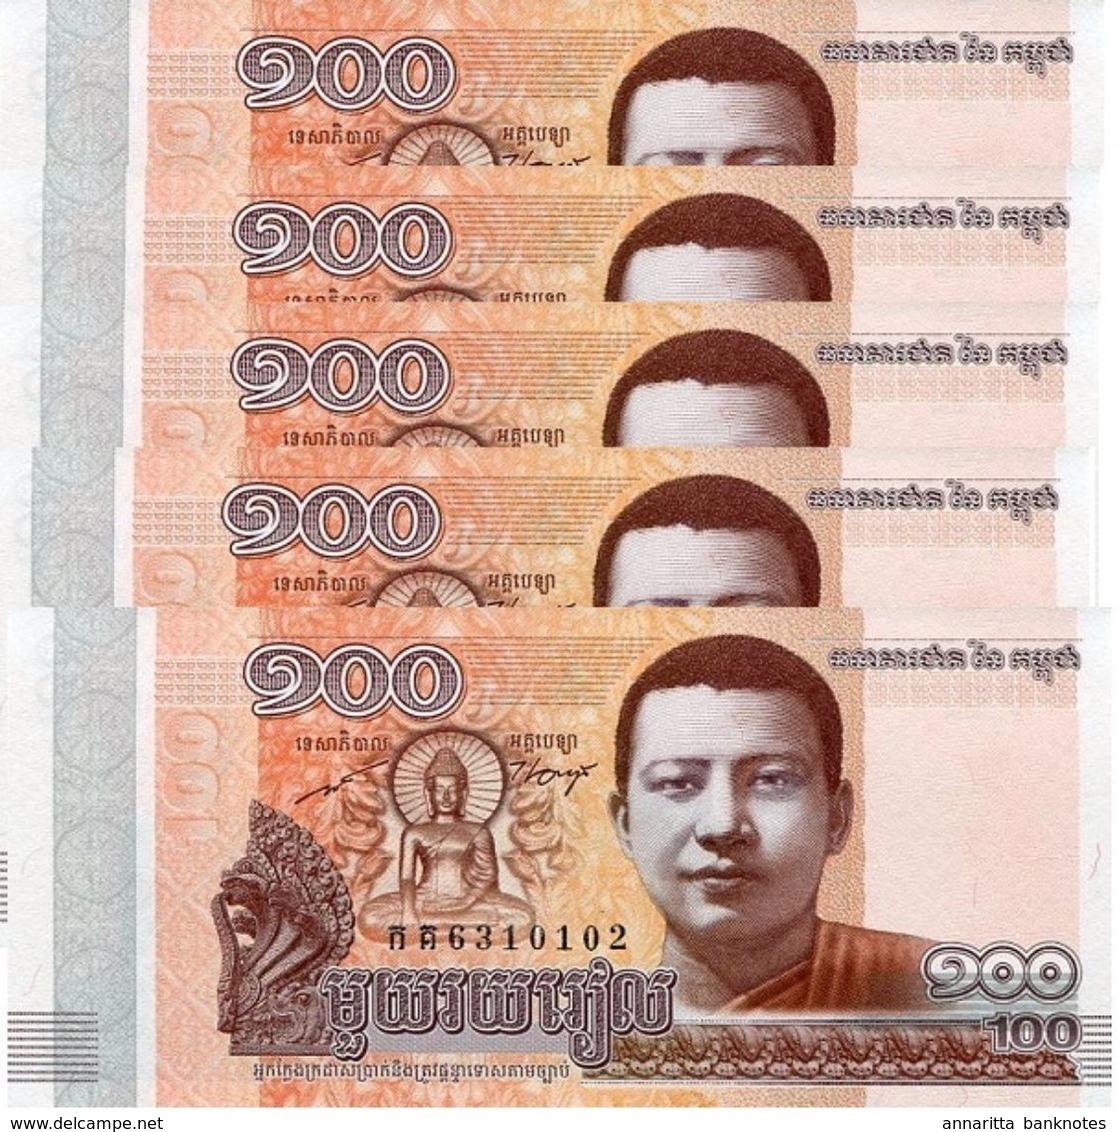 CAMBODIA 100 RIELS 2014 (2015) P-65a UNC 5 PCS [KH428a] - Cambodia